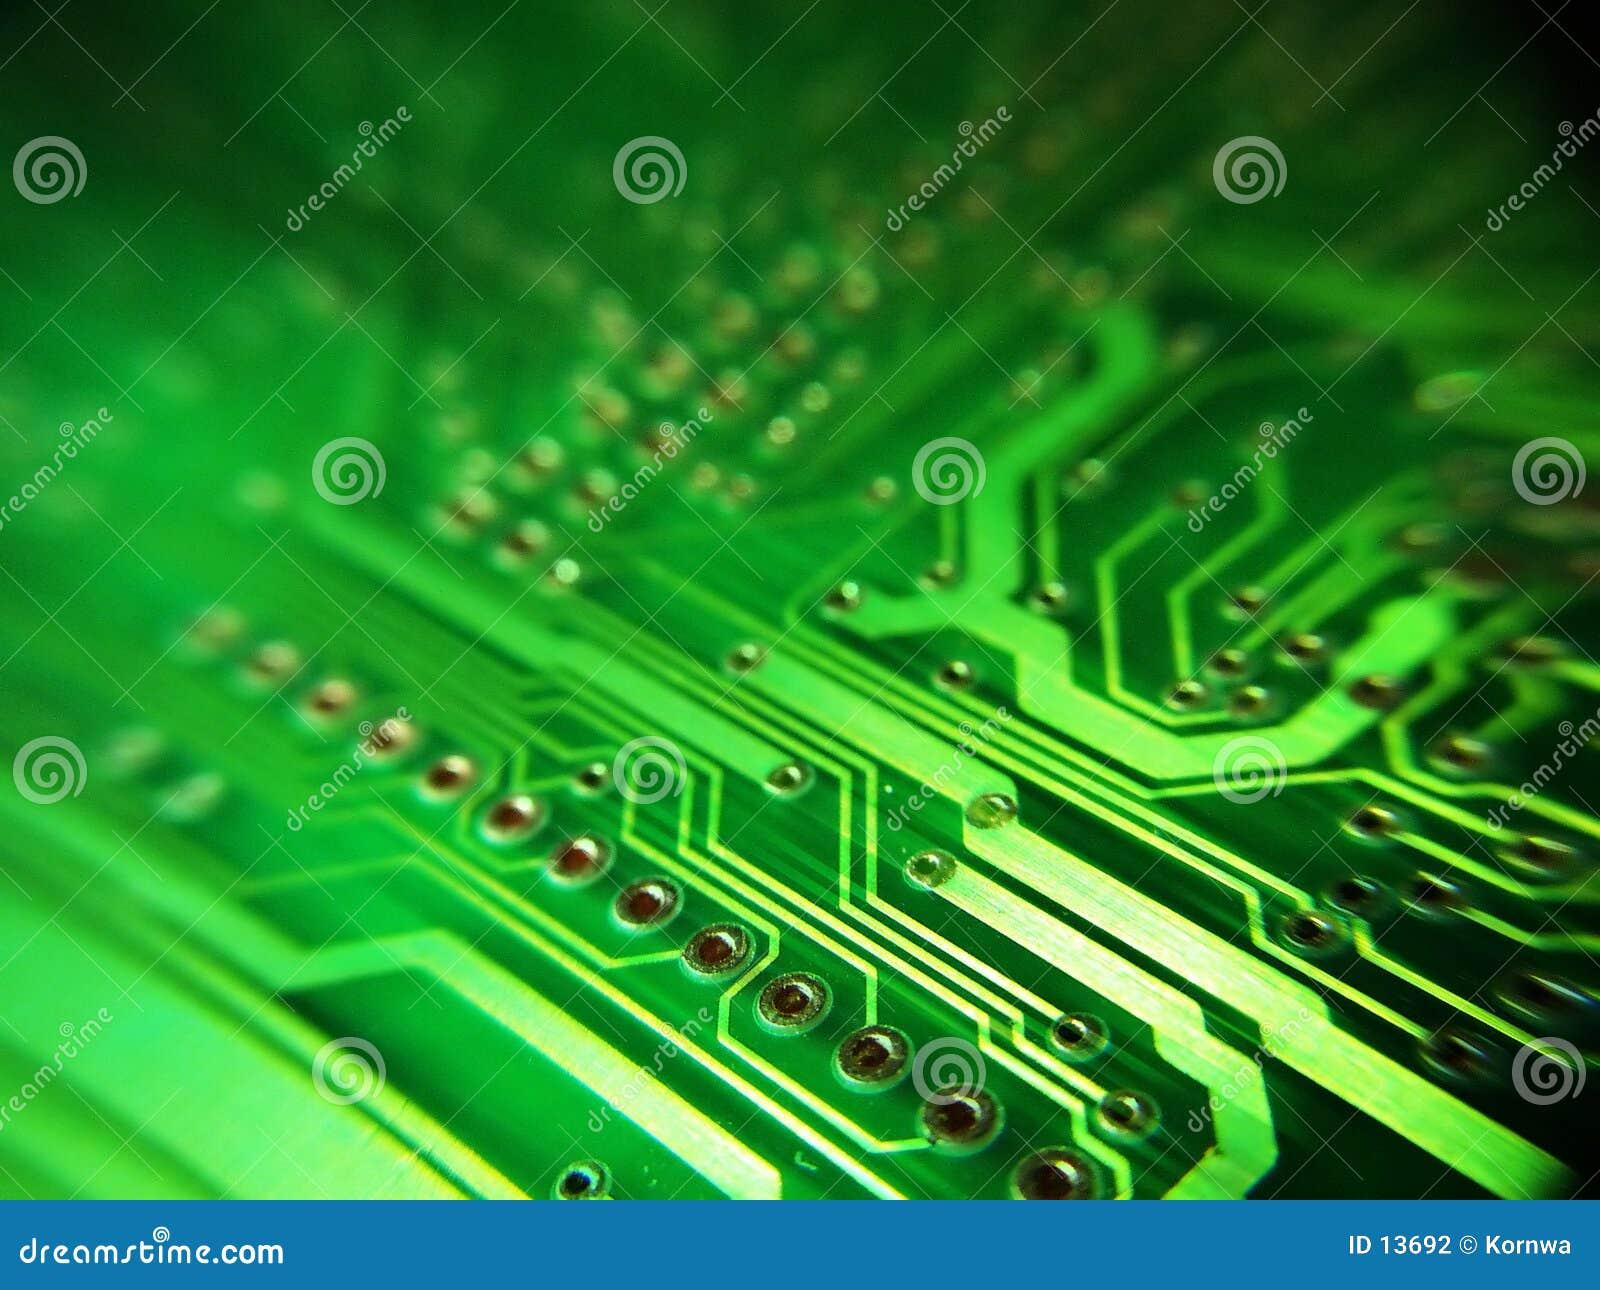 Electronics Board Stock Photo Image Of Electicity